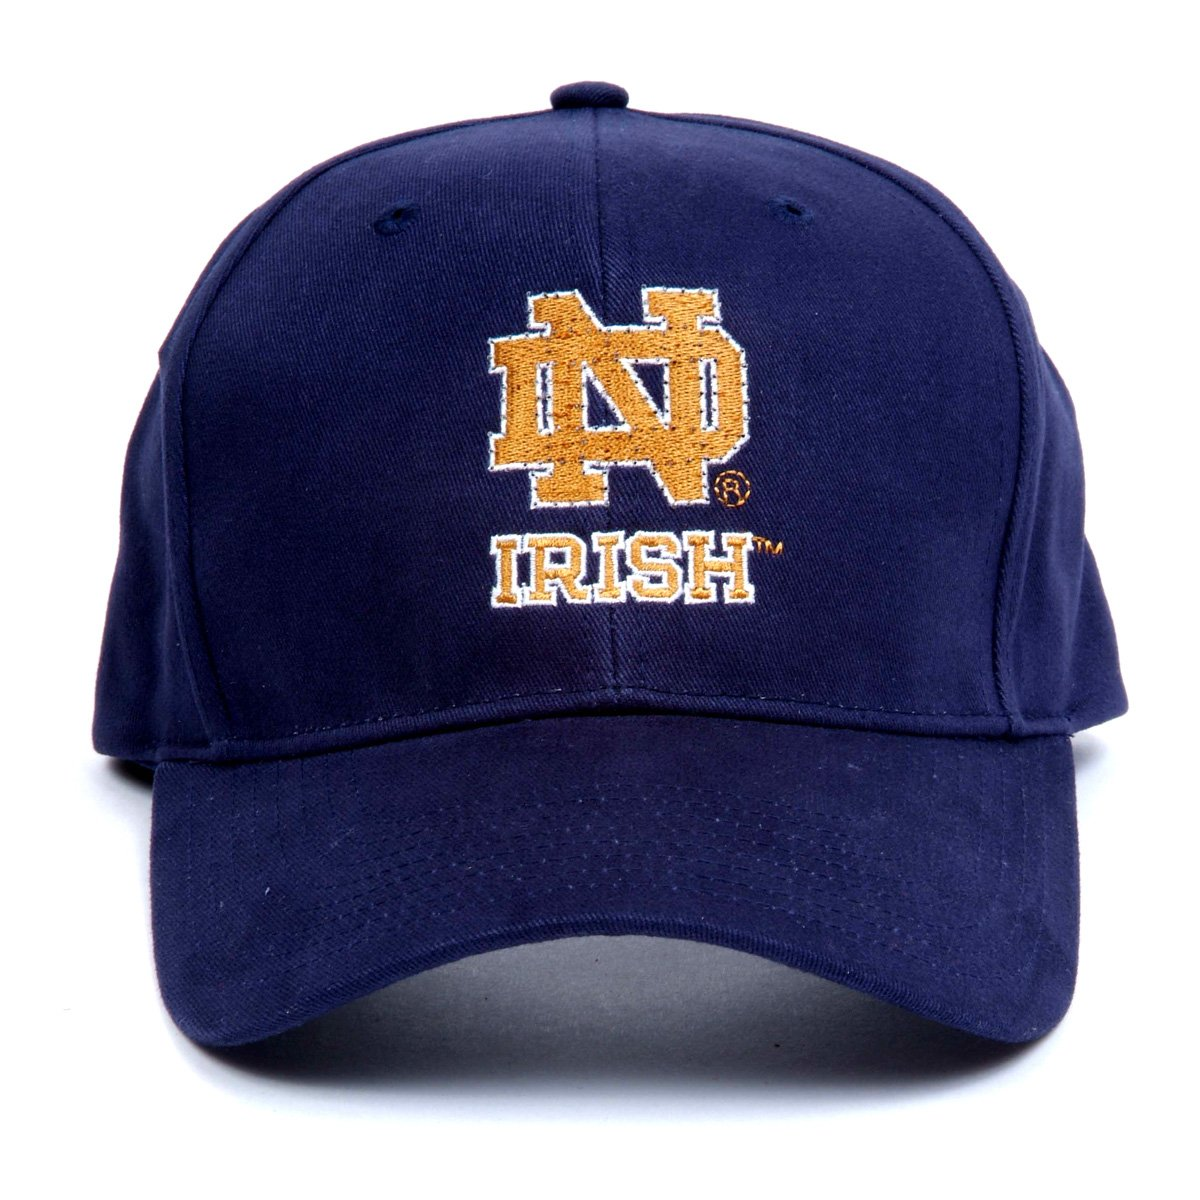 Notre dame bathroom accessories - Amazon Com Ncaa Notre Dame Fighting Irish Led Light Up Logo Adjustable Hat Sports Fan Baseball Caps Sports Outdoors